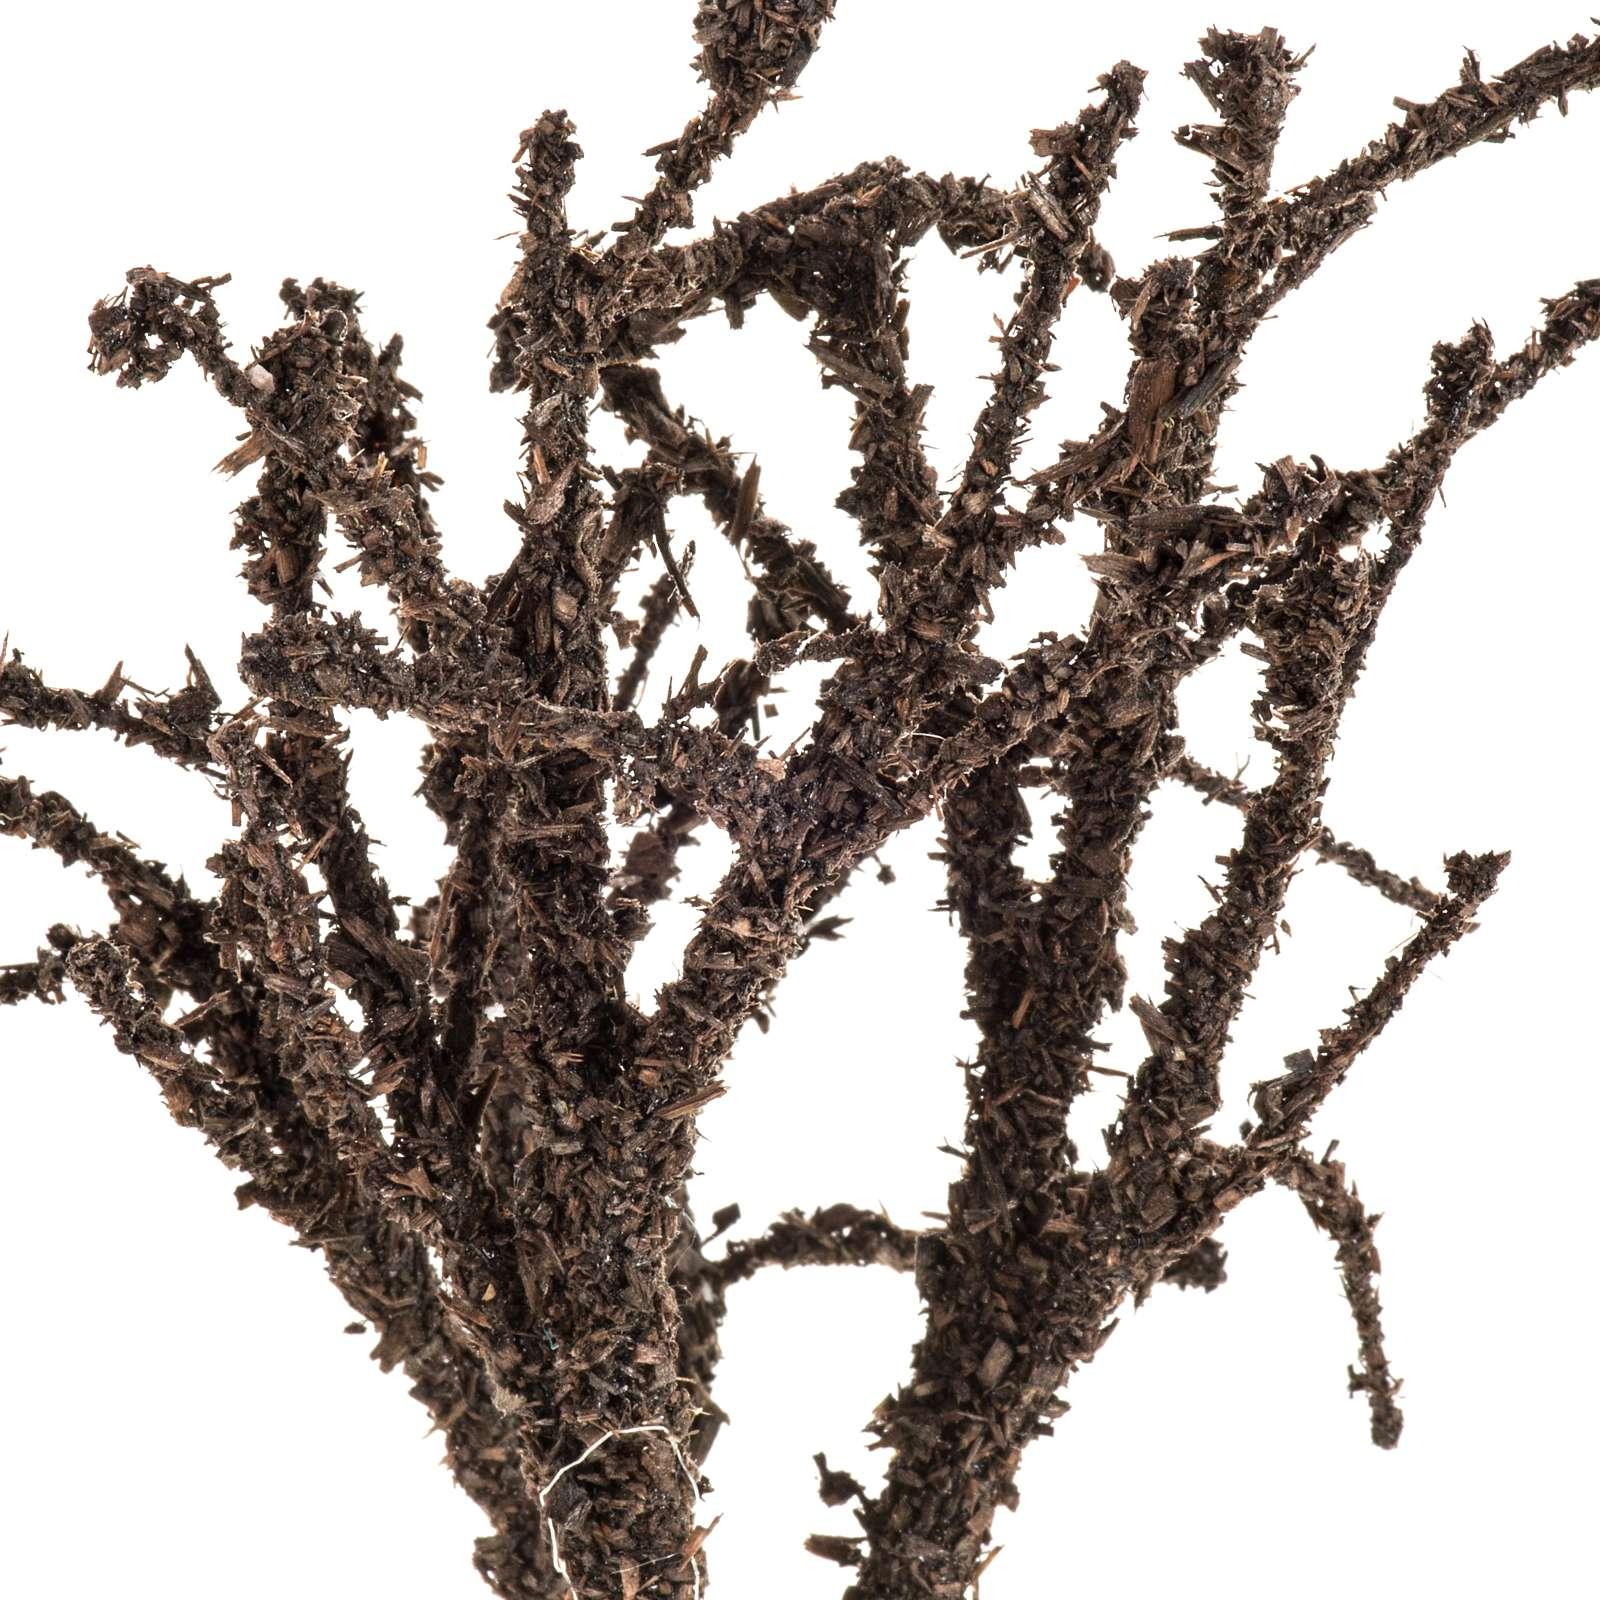 Albero spoglio h 15 cm 4